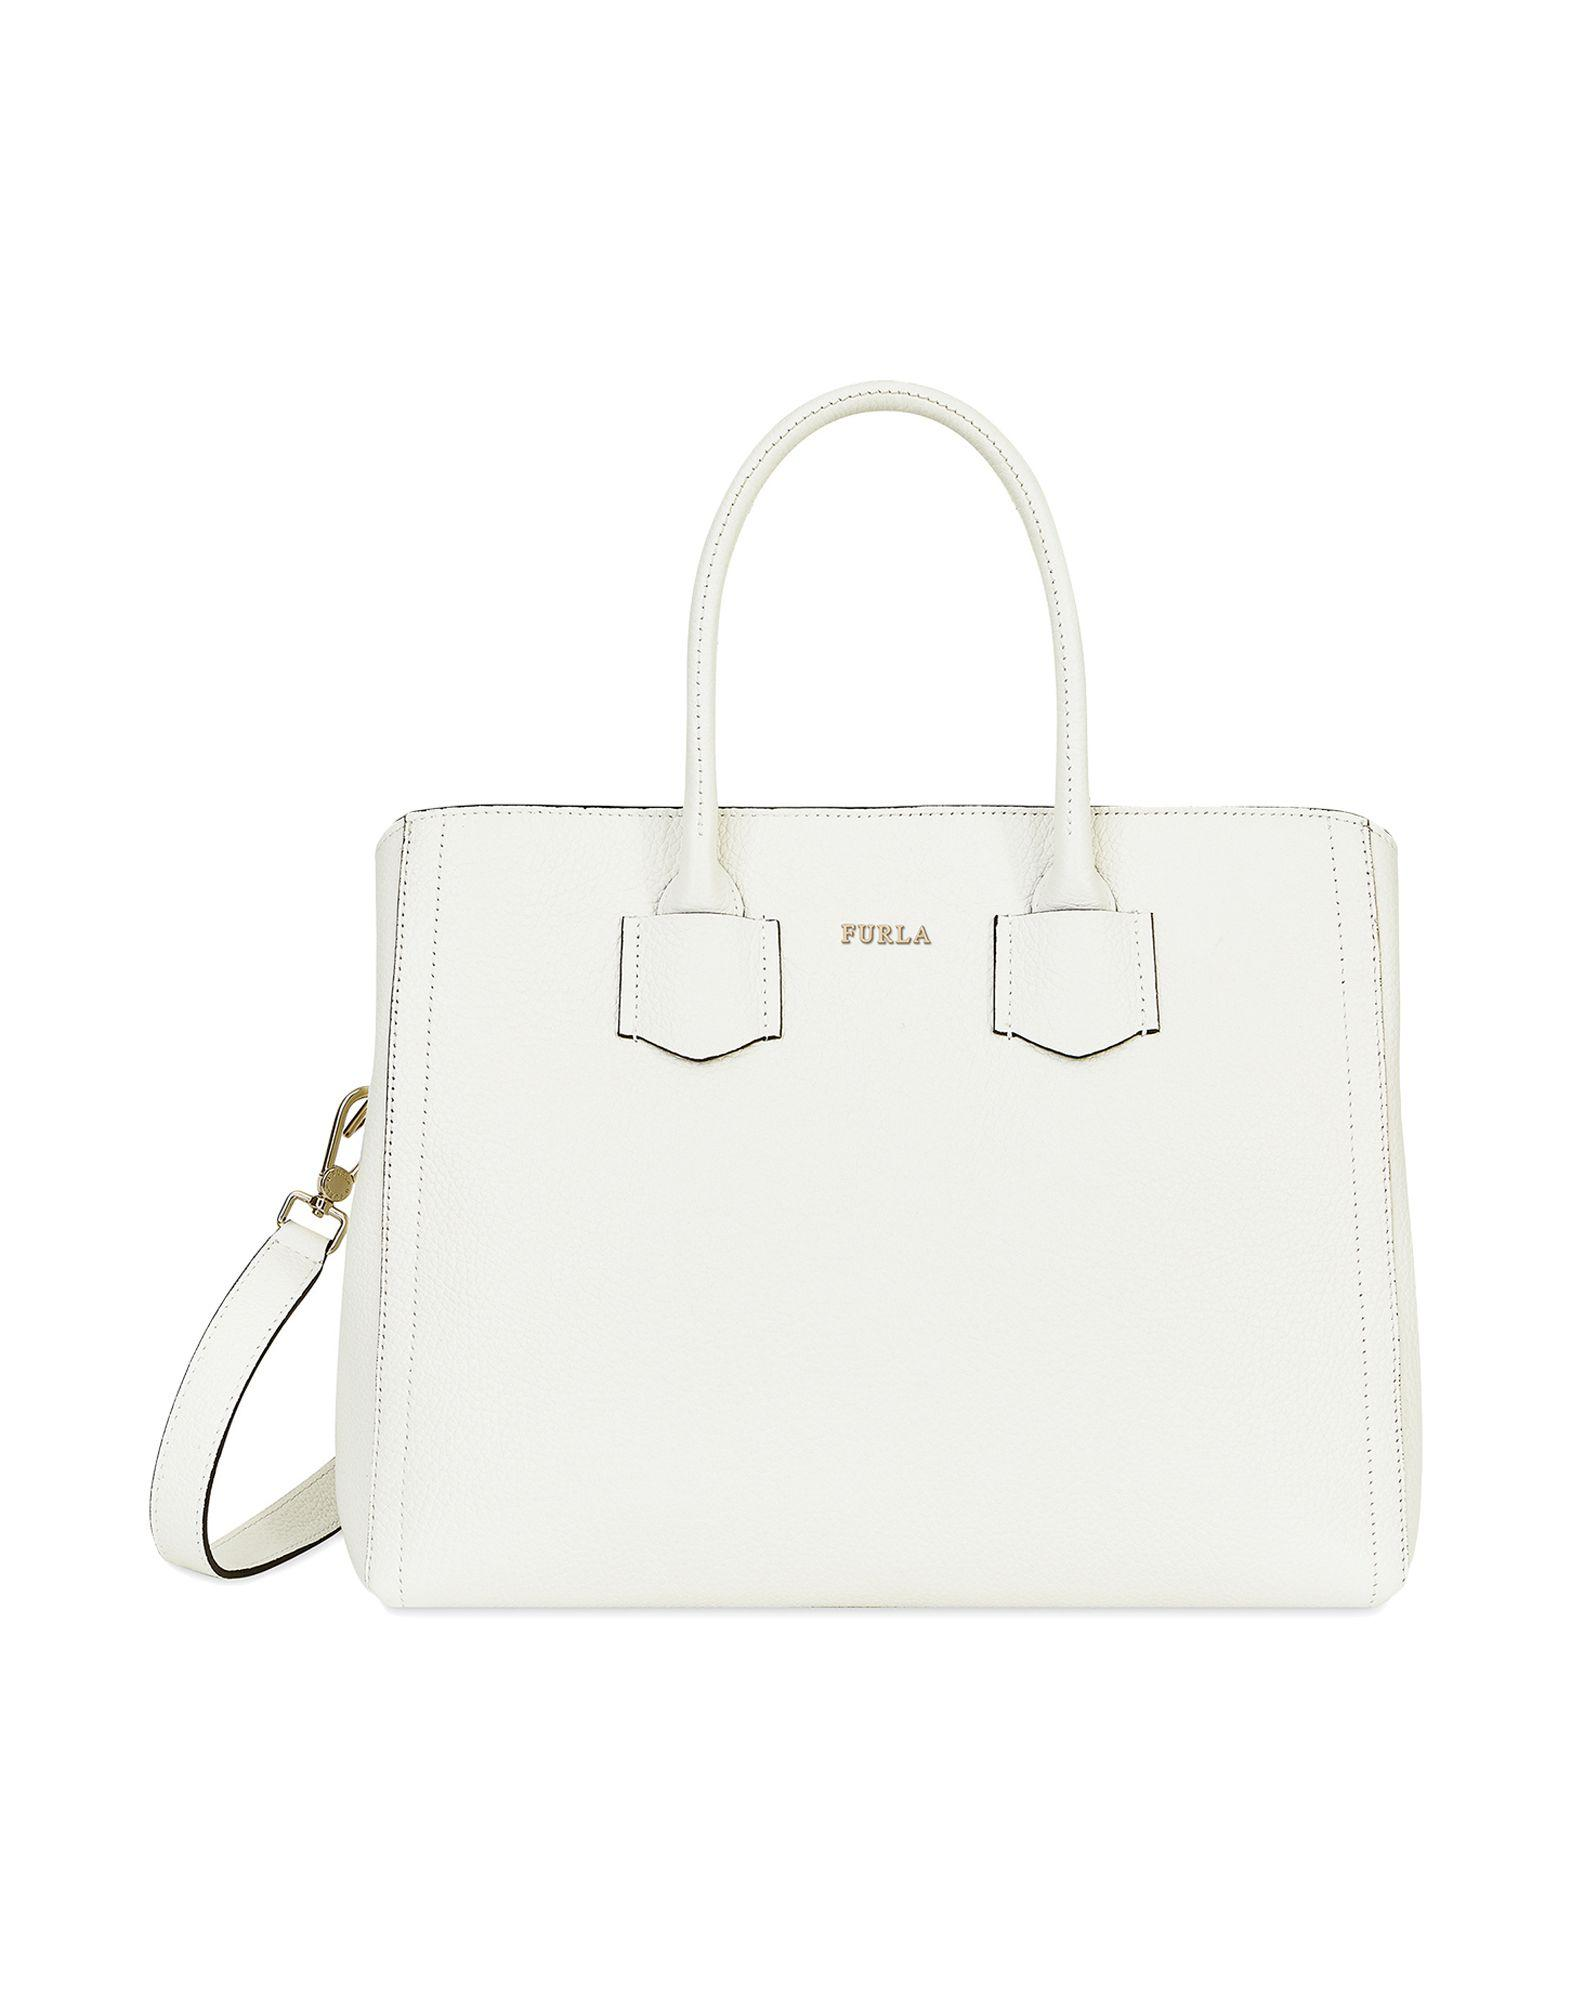 7de50cd5d024 Furla - White Handbag - Lyst. View fullscreen